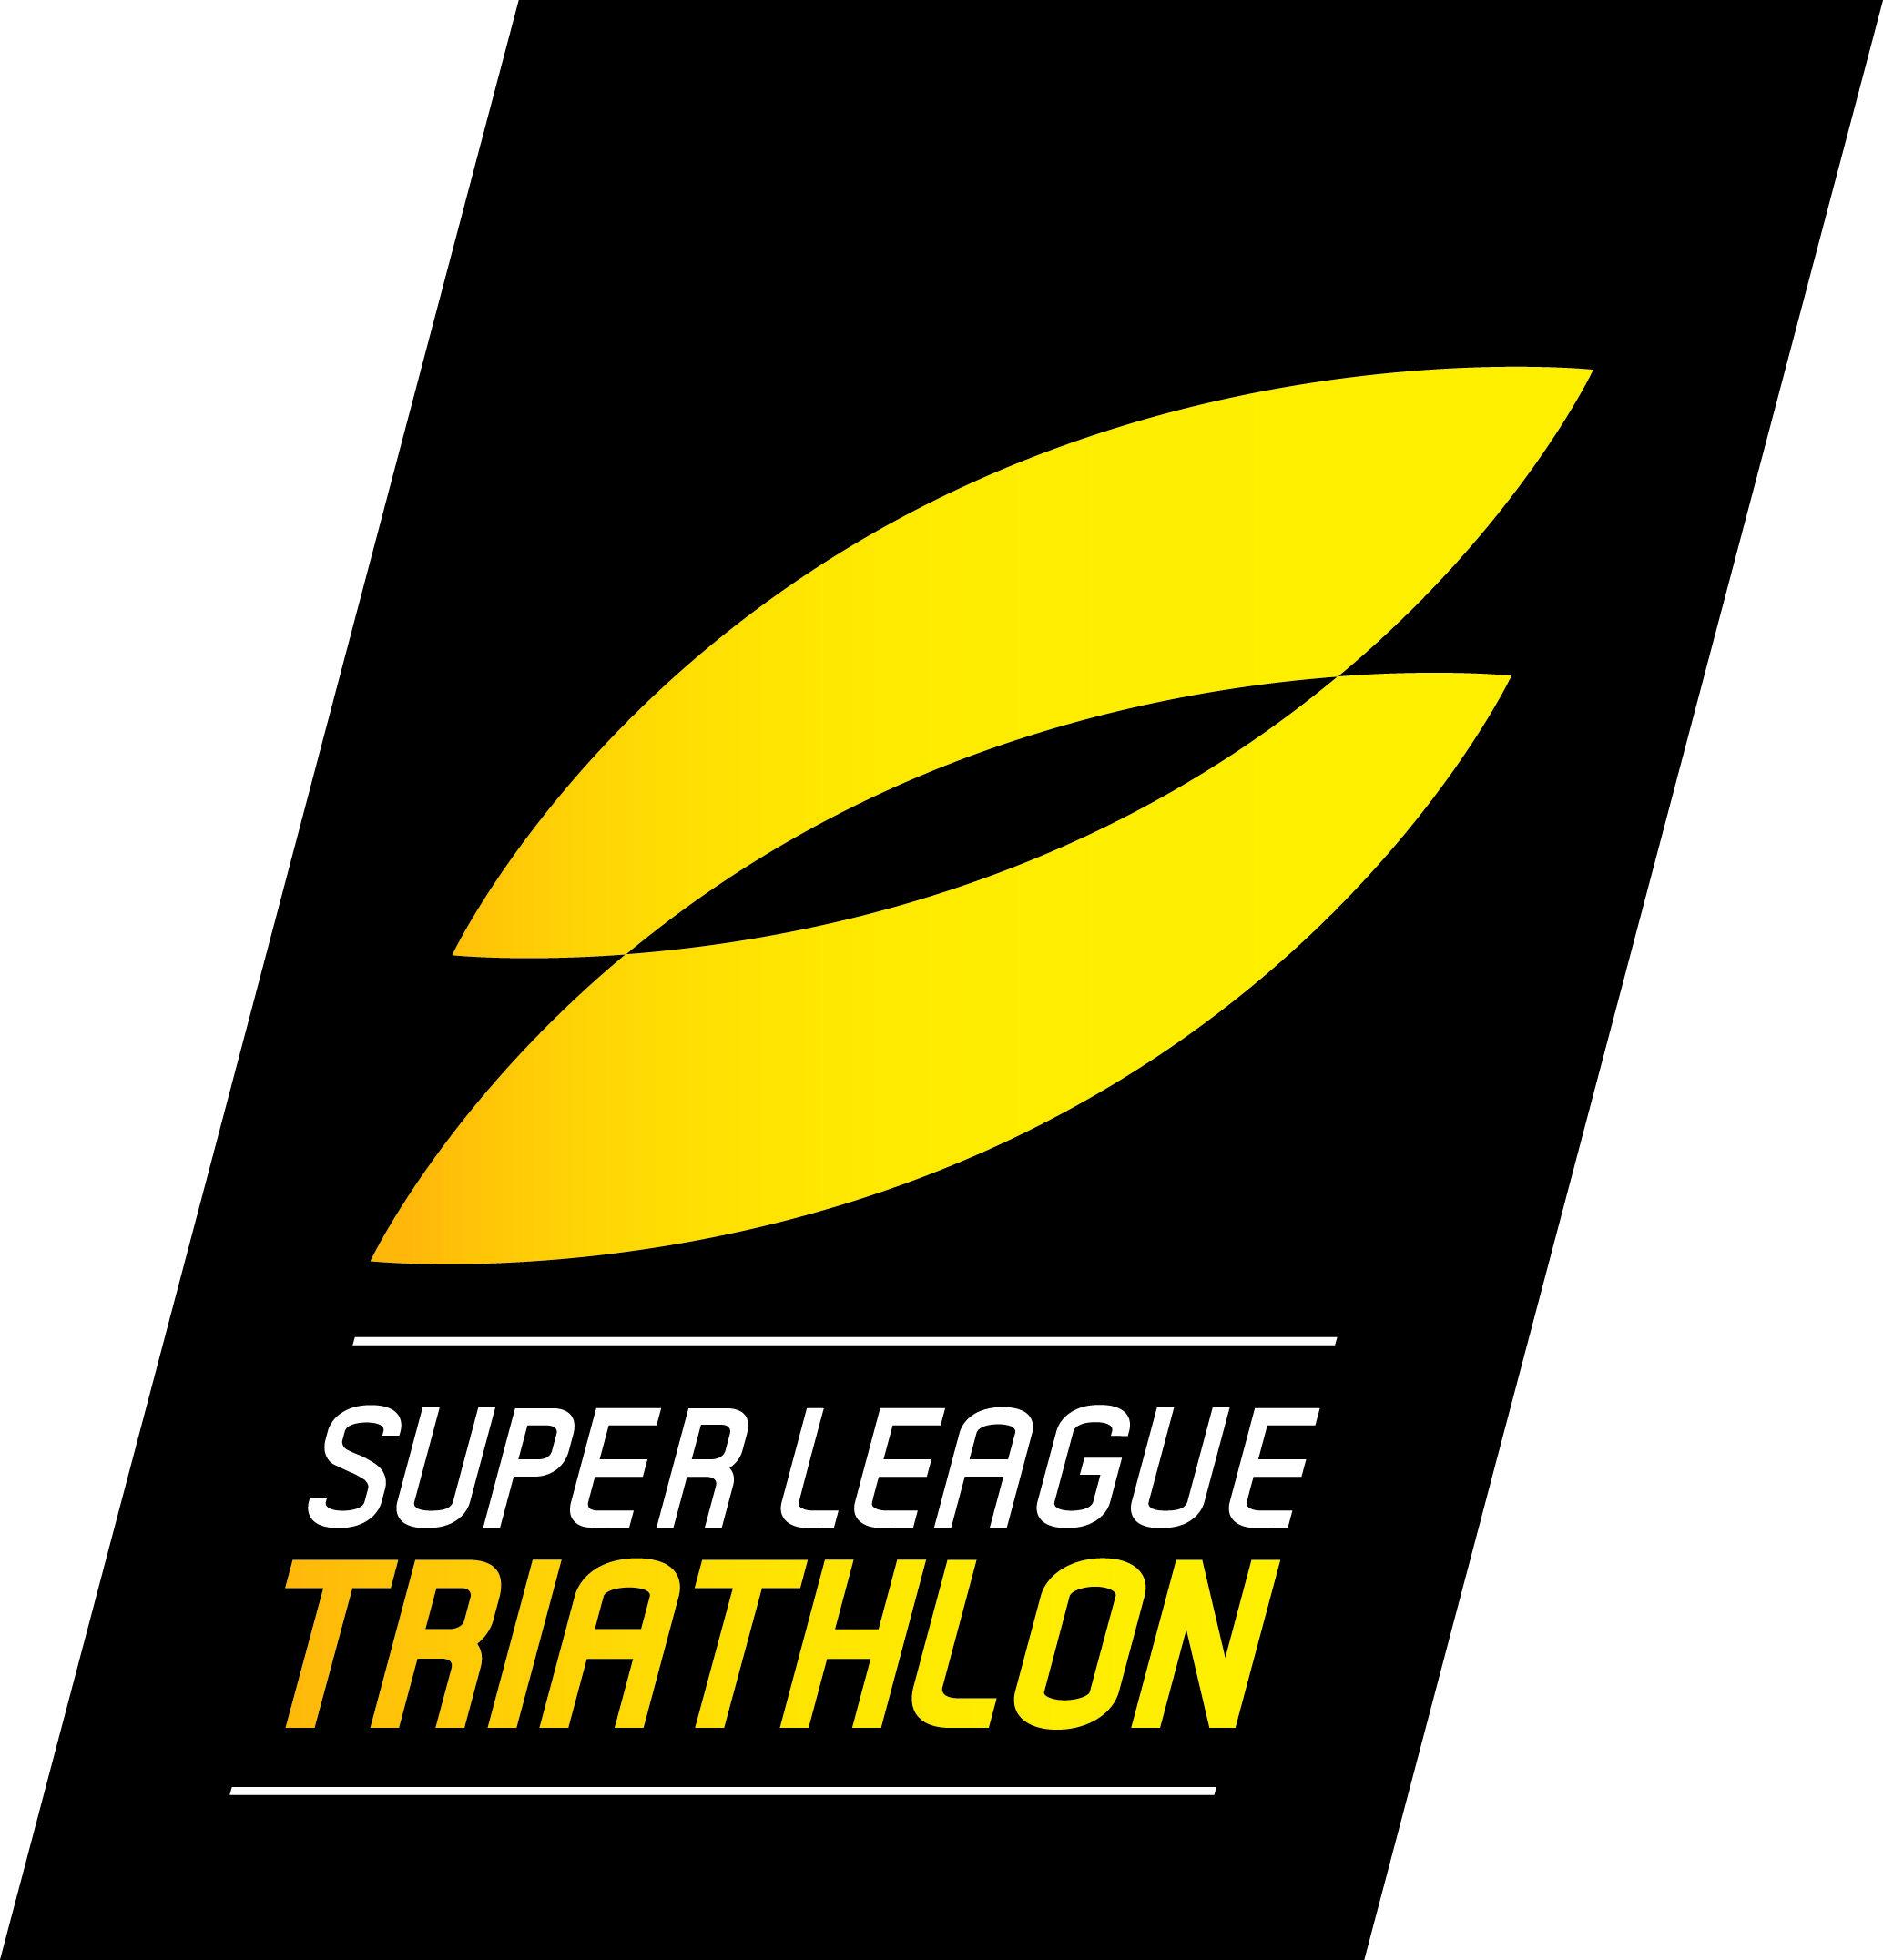 Super League Triathlon's logo